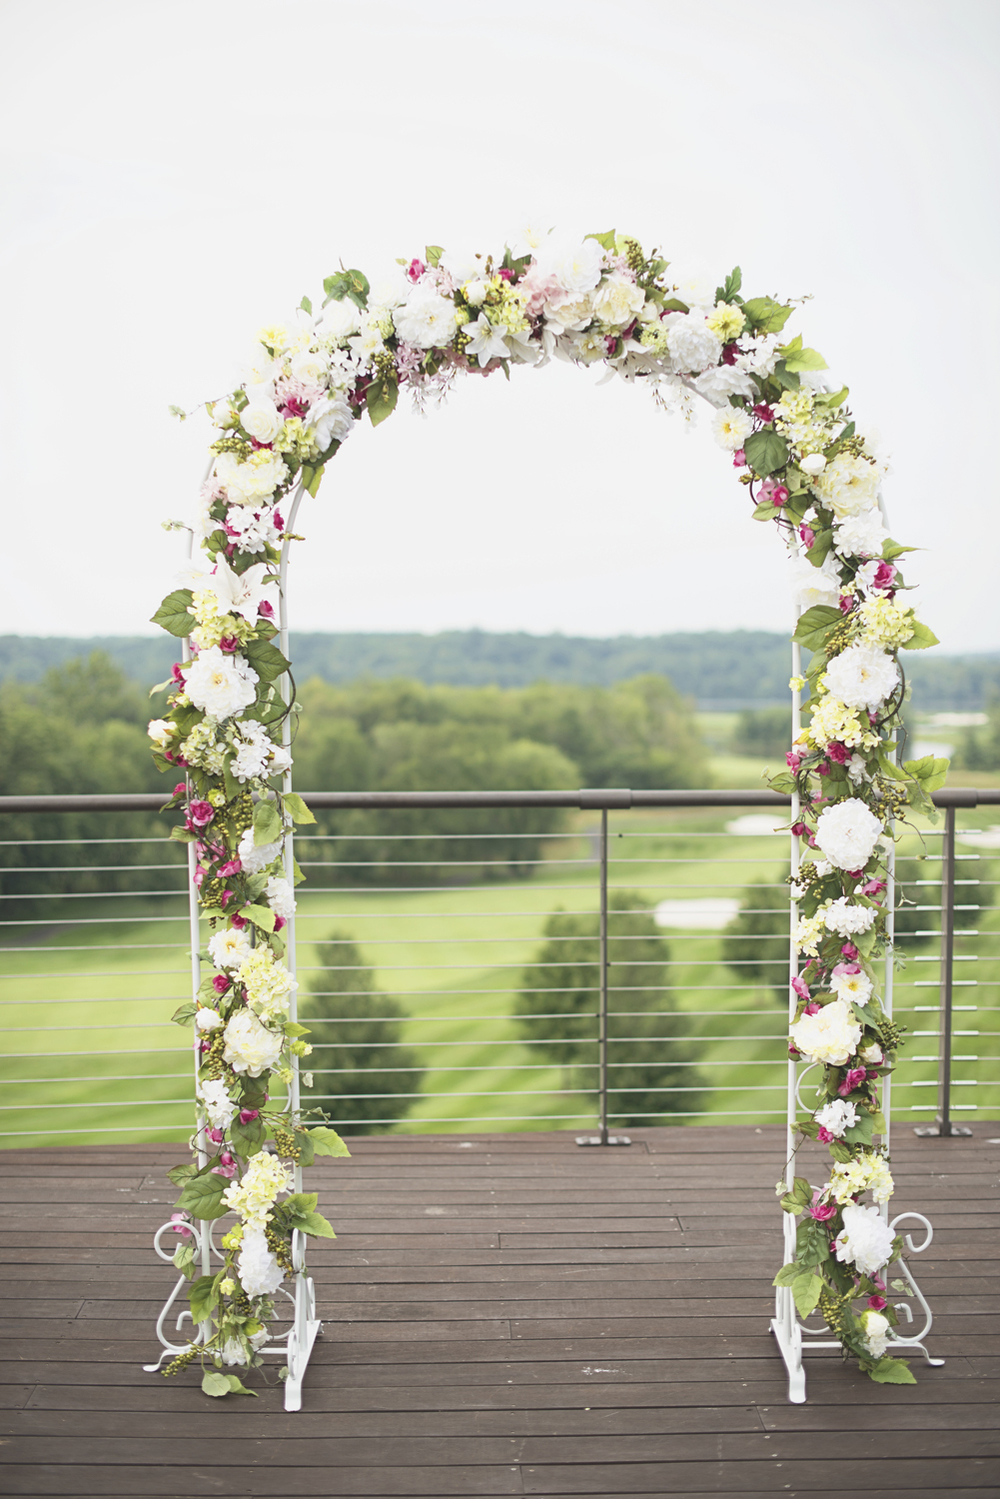 Trump National Golf Club Wedding | Washington, DC Wedding | Wedding ceremony | Pink, white, and green floral arch